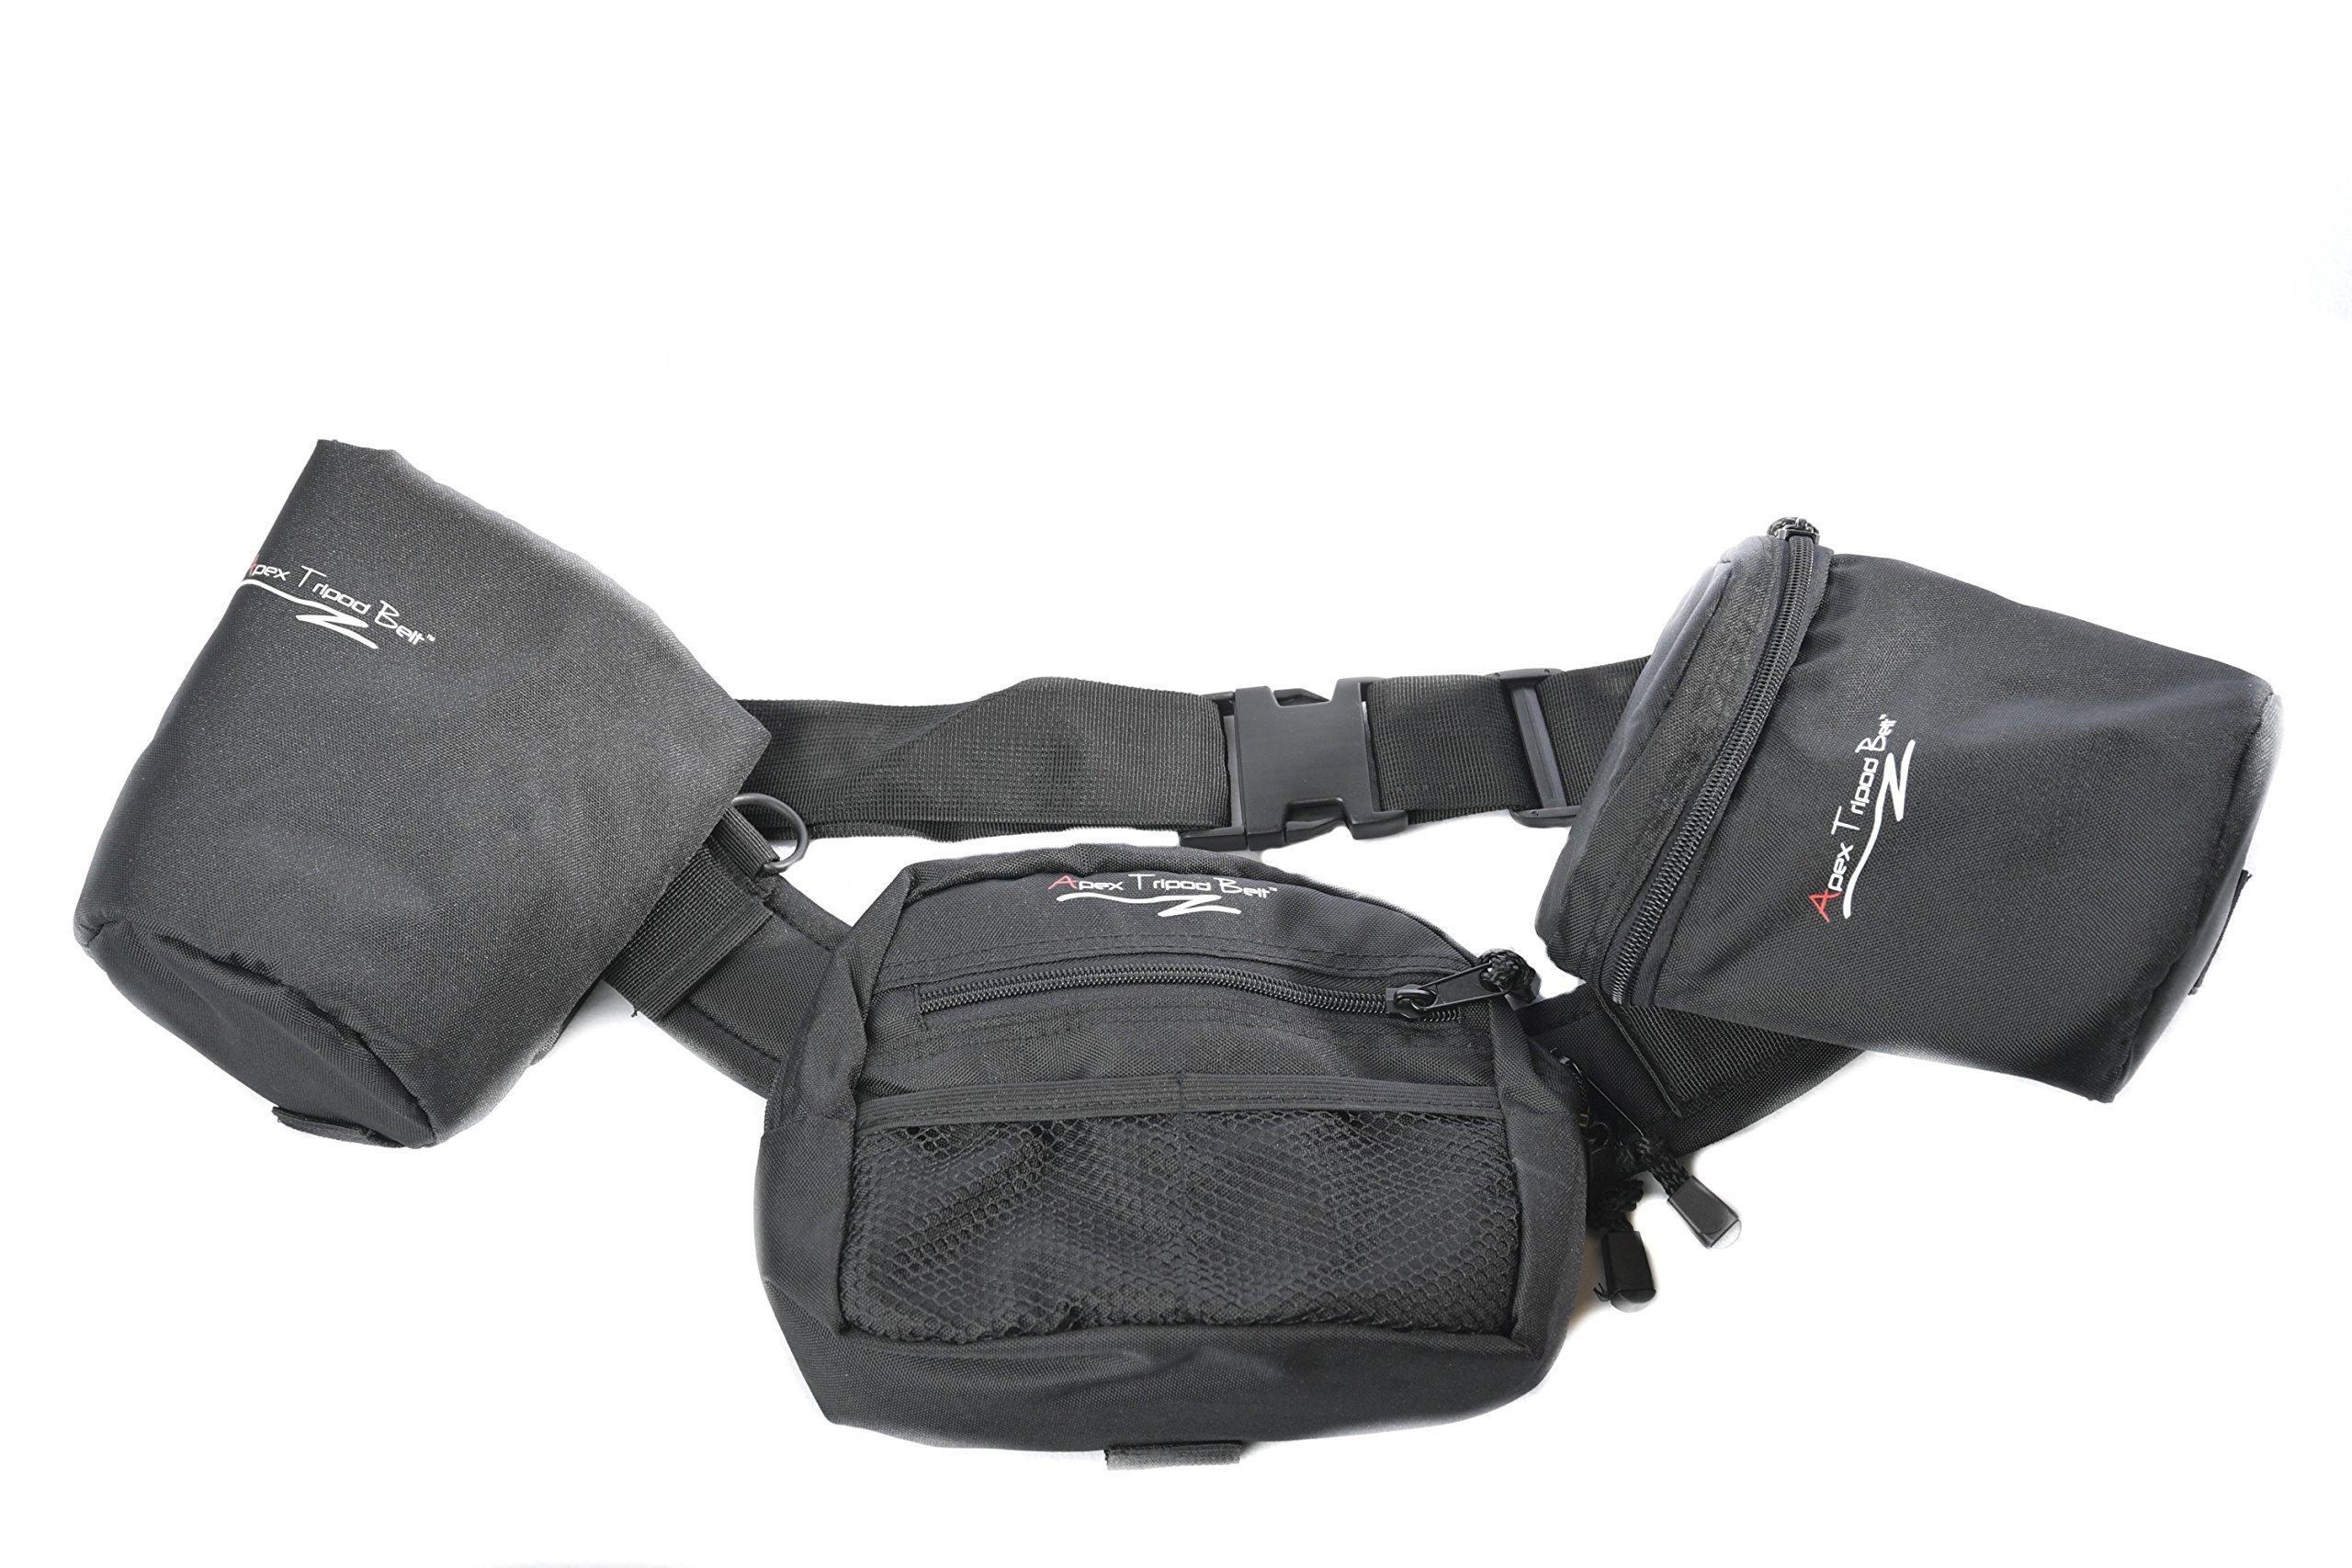 EPGear Apex Utility Pouch Bundle -Black by EP Gear